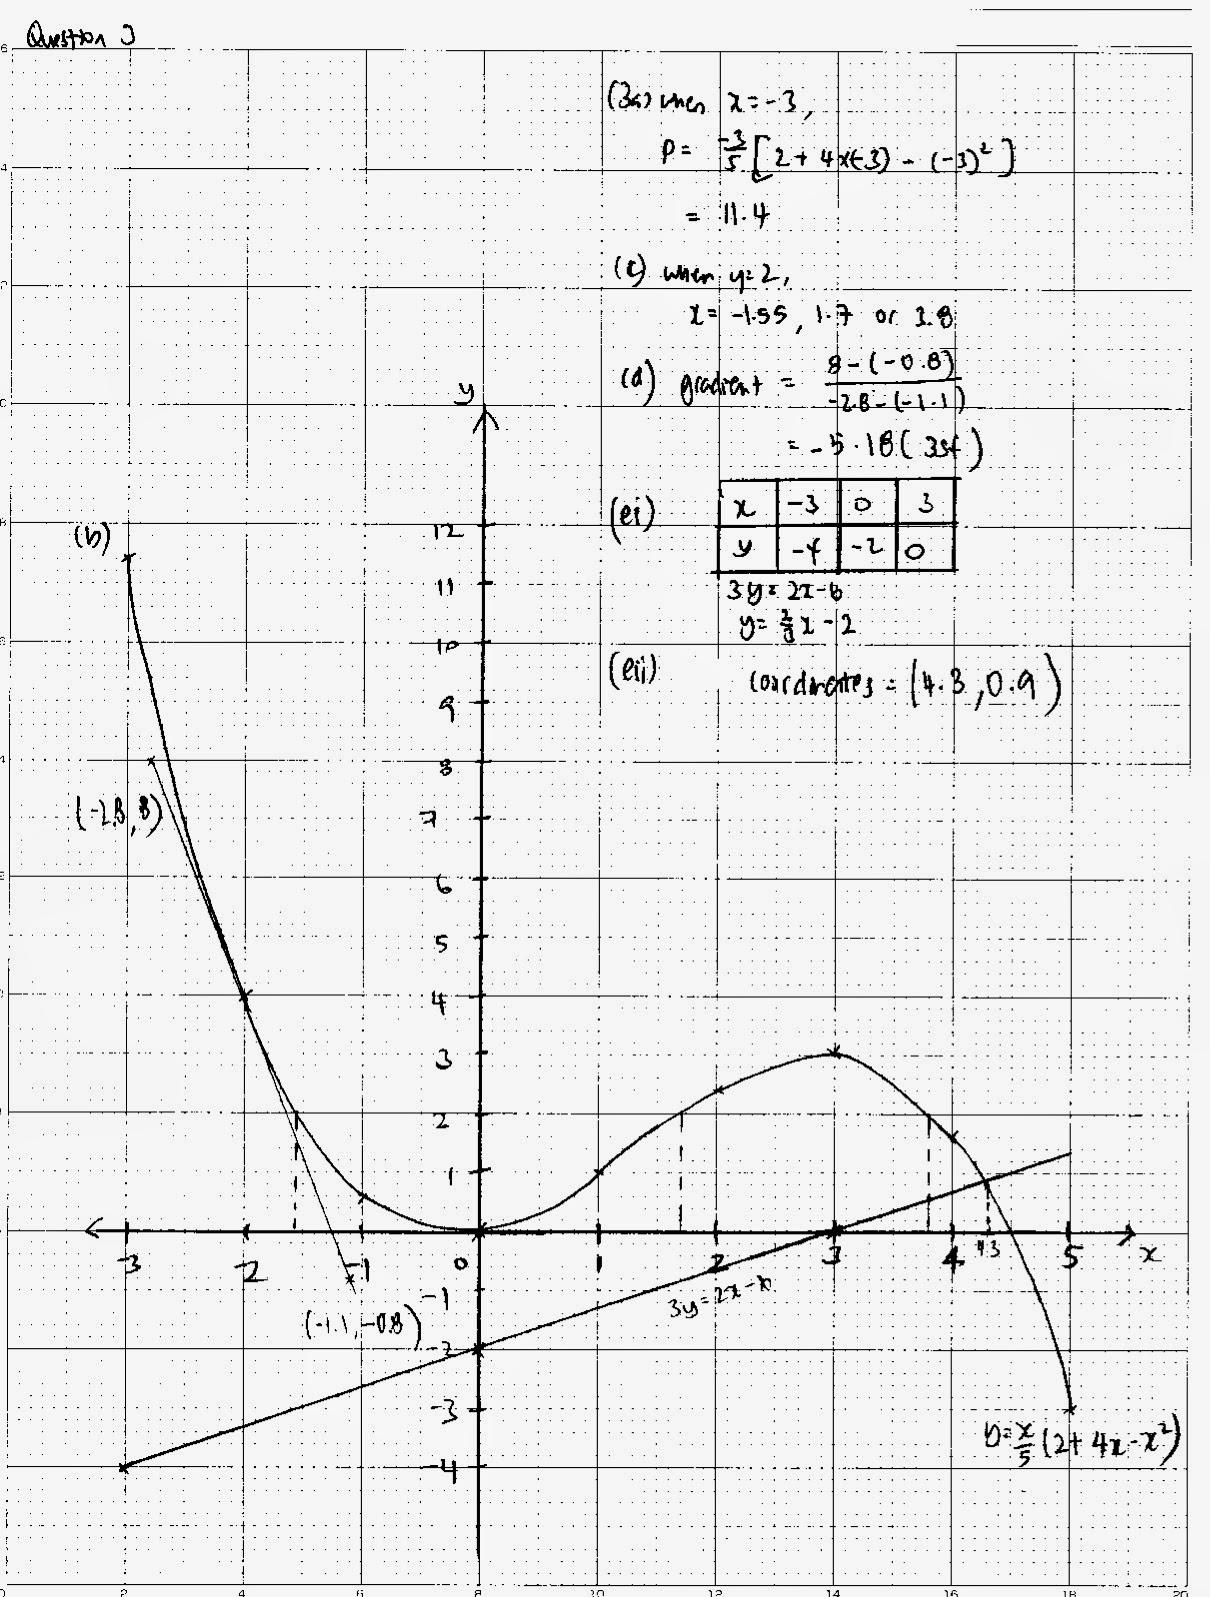 Clarice the PSLE and O Level Maths Tutor (PSLE Maths